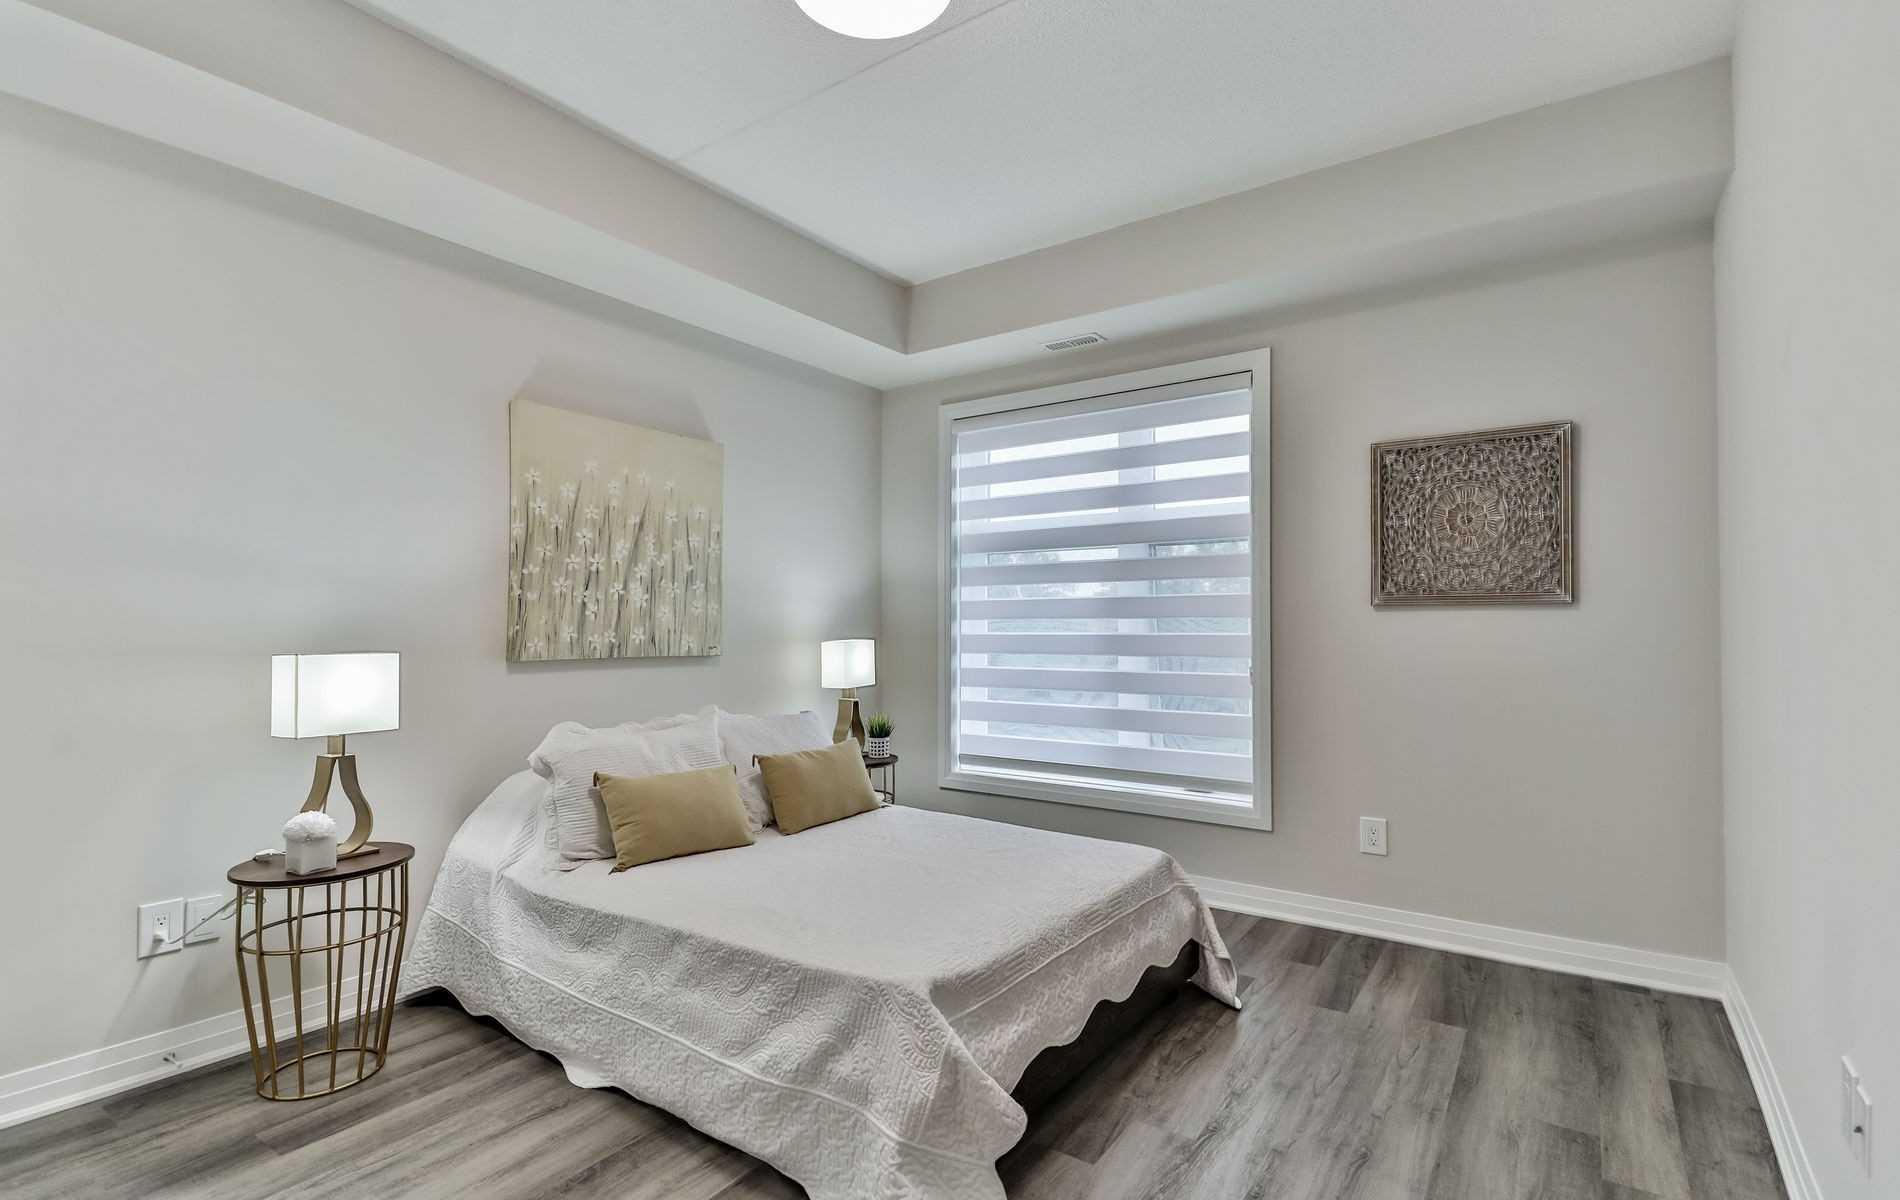 316 - 610 Farmstead Dr - Willmont Condo Apt for sale, 2 Bedrooms (W5399854) - #18